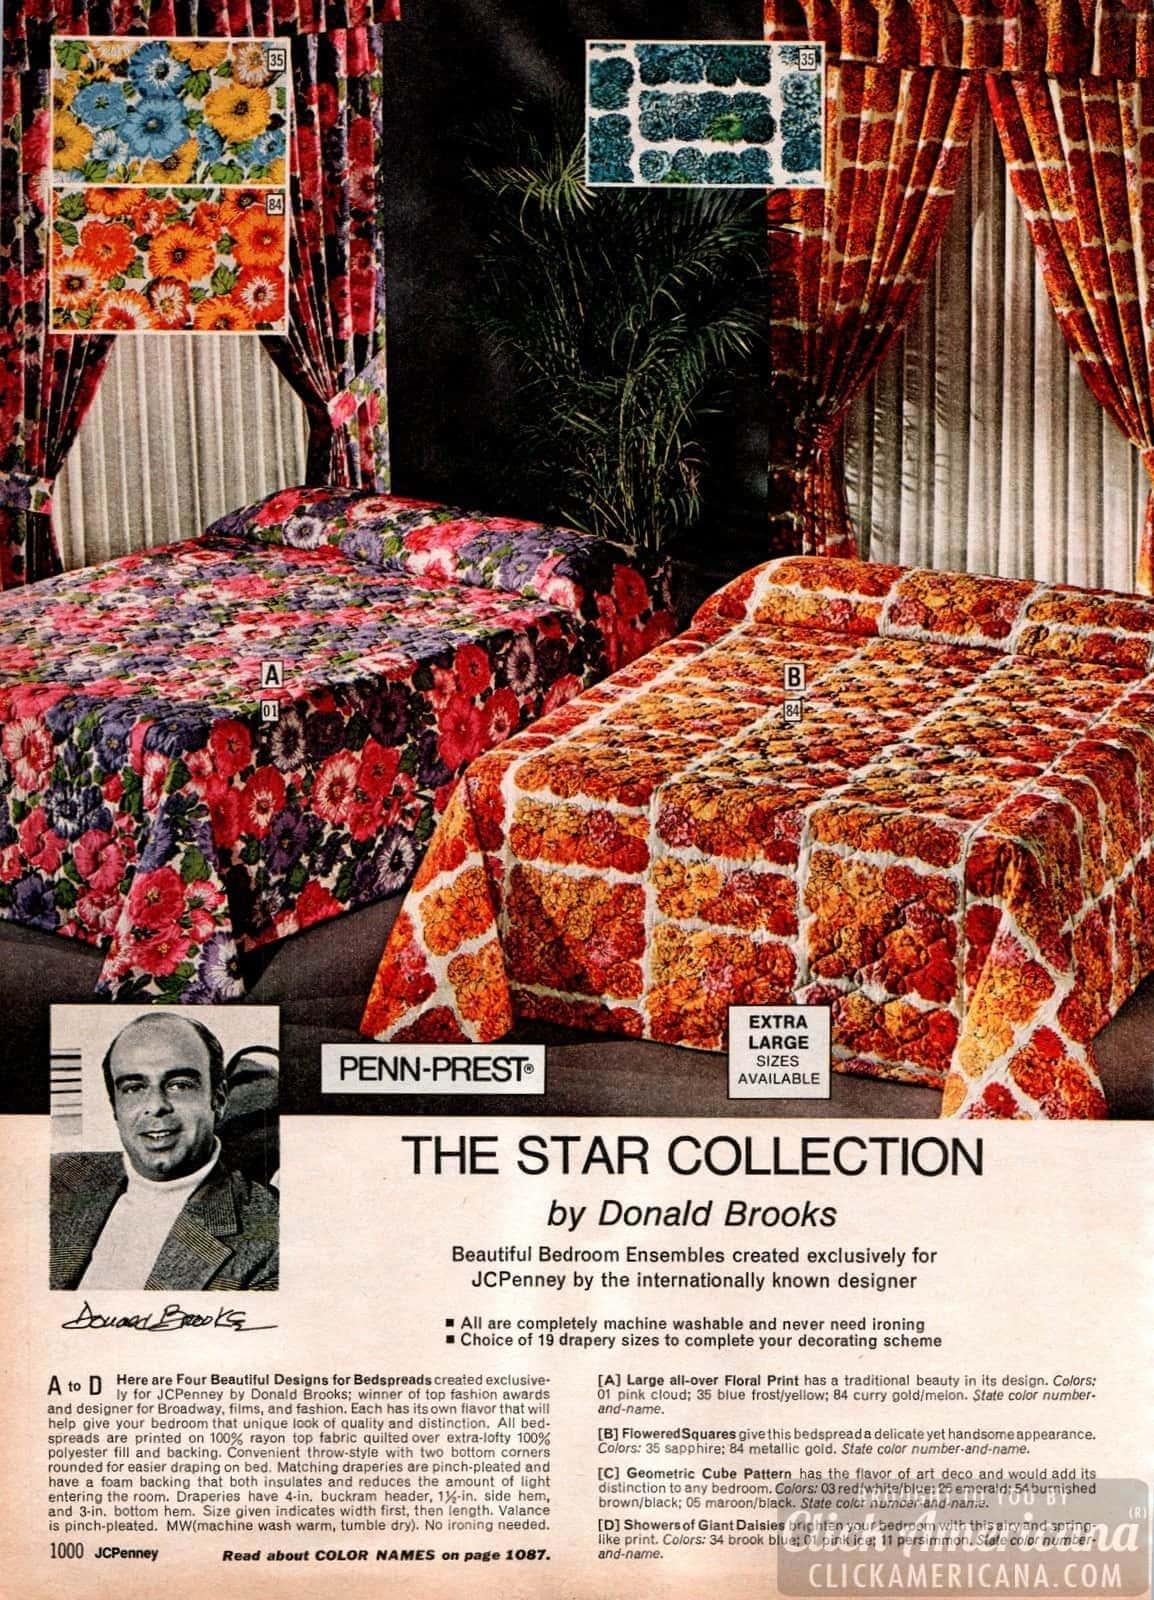 Donald Brooks designer bedding - Floral print ensembles